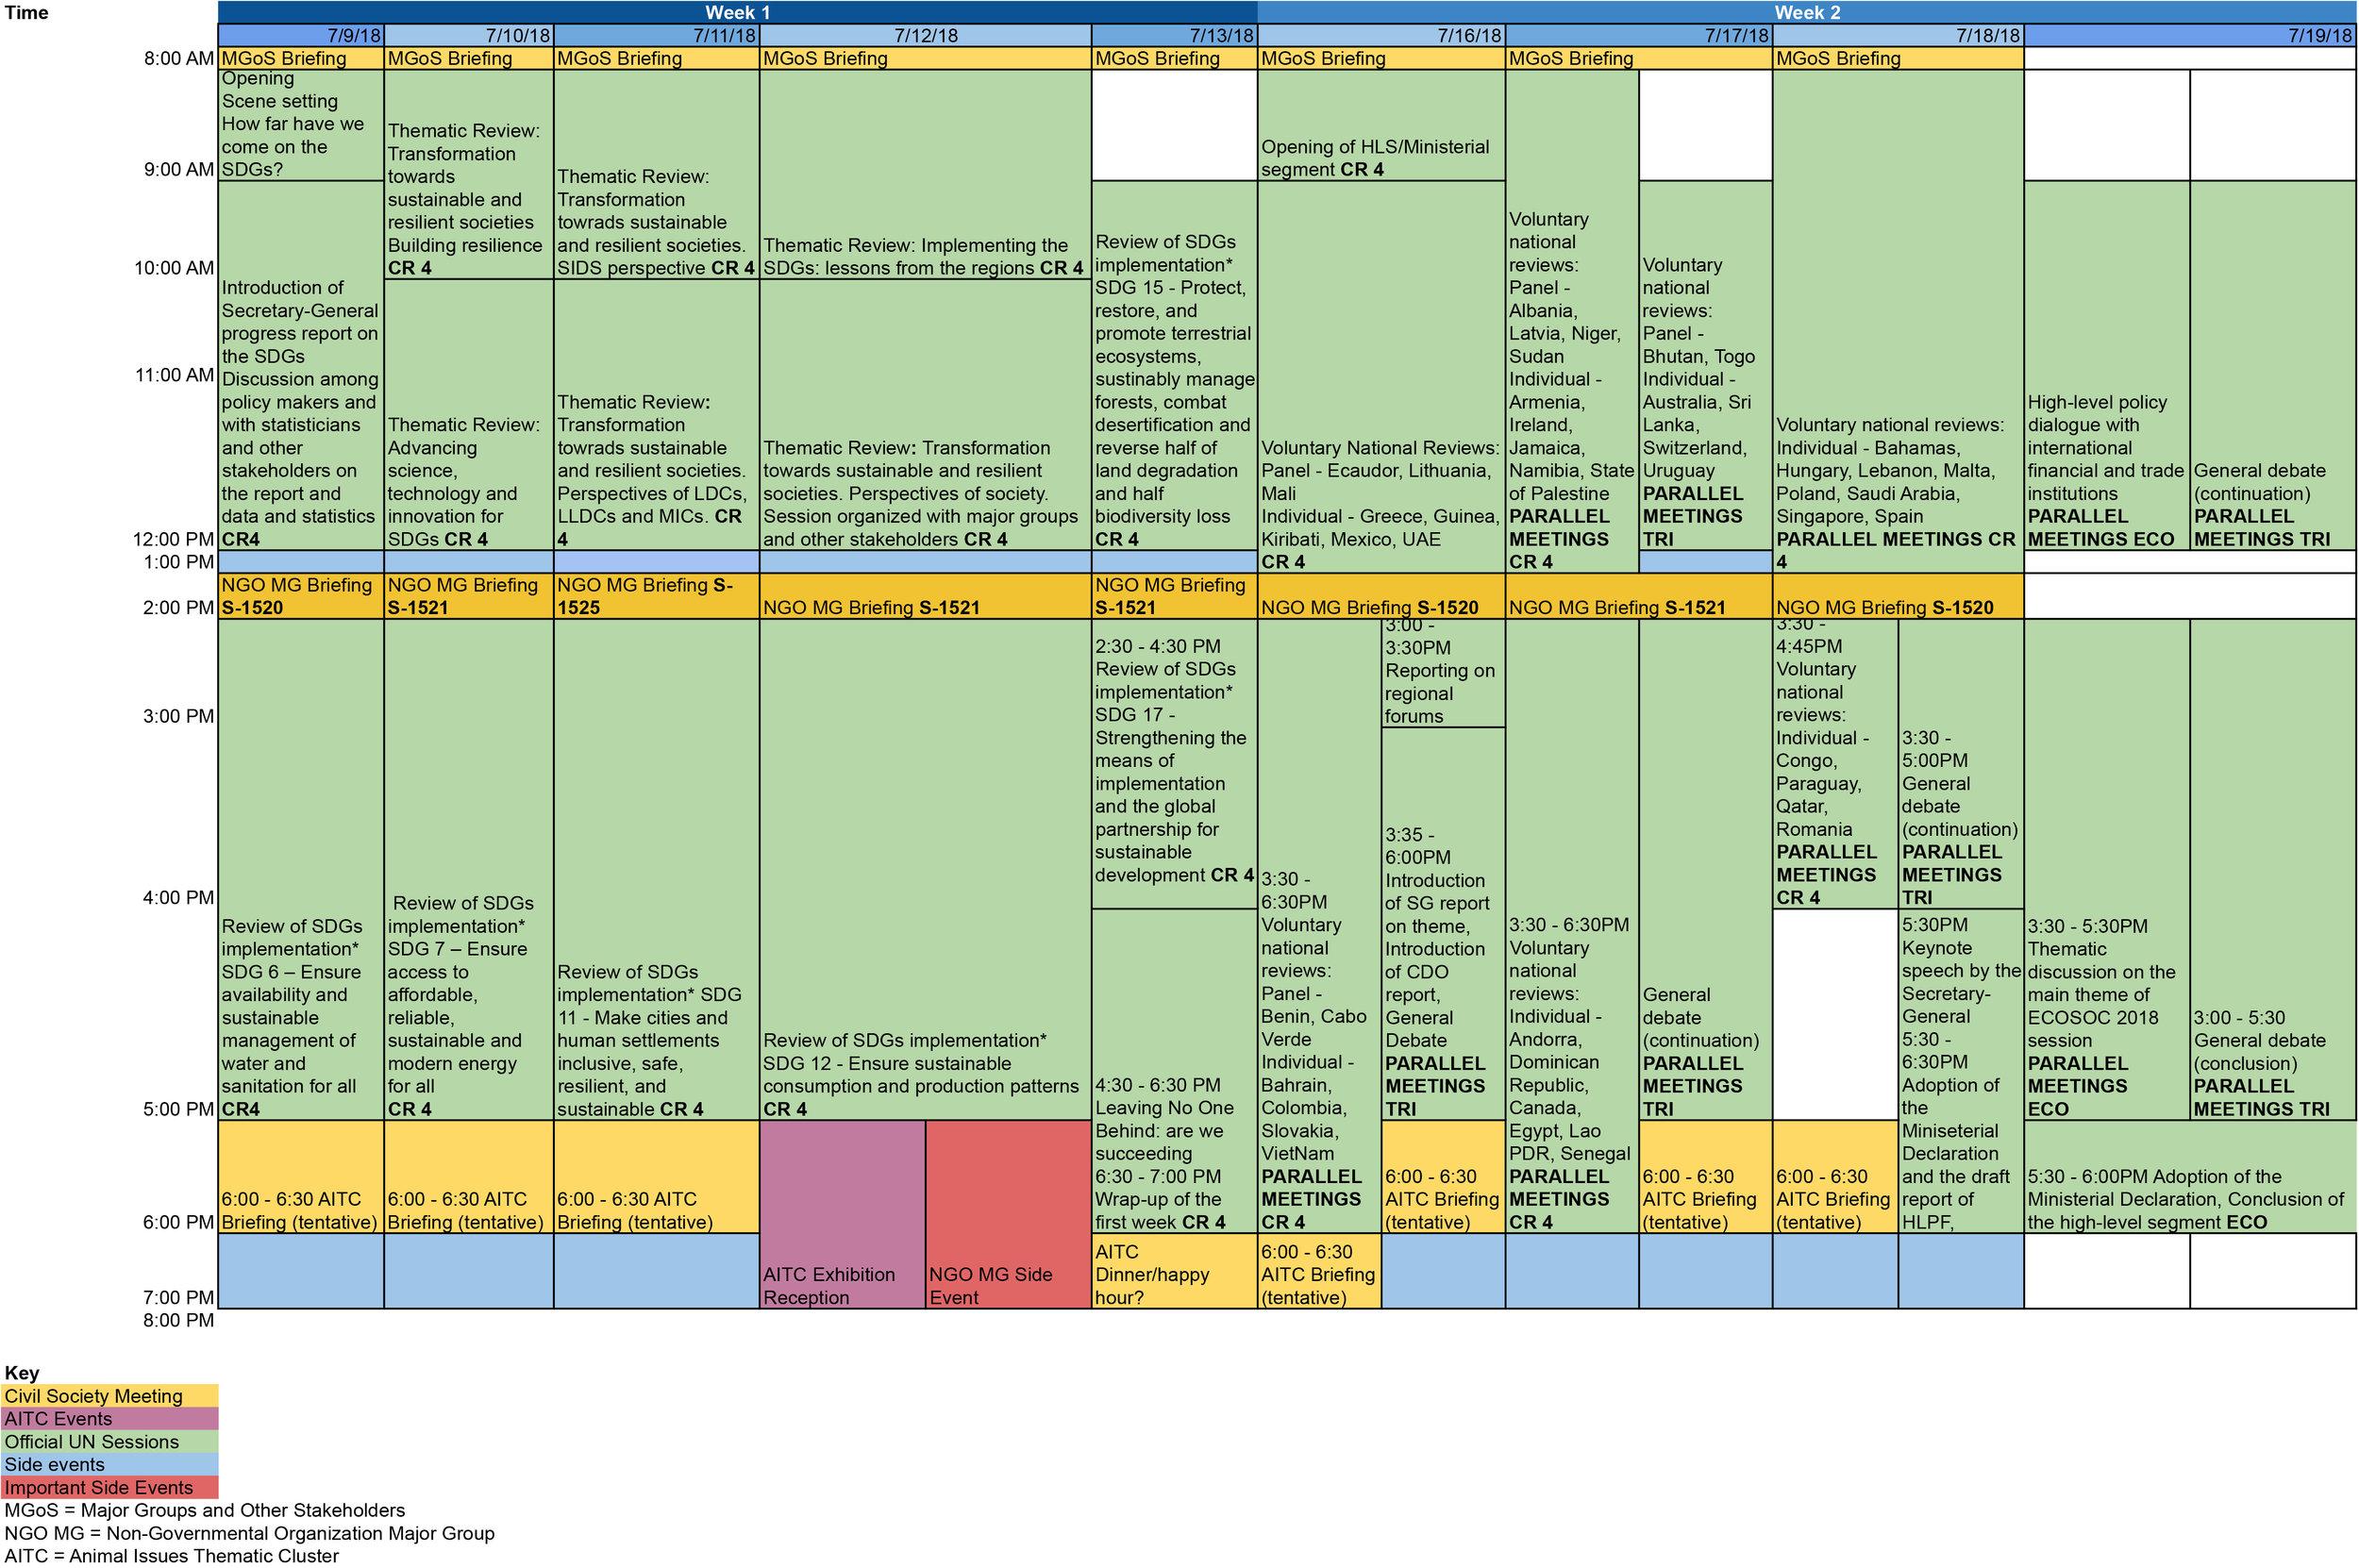 HLPF Reference Sheet.jpg